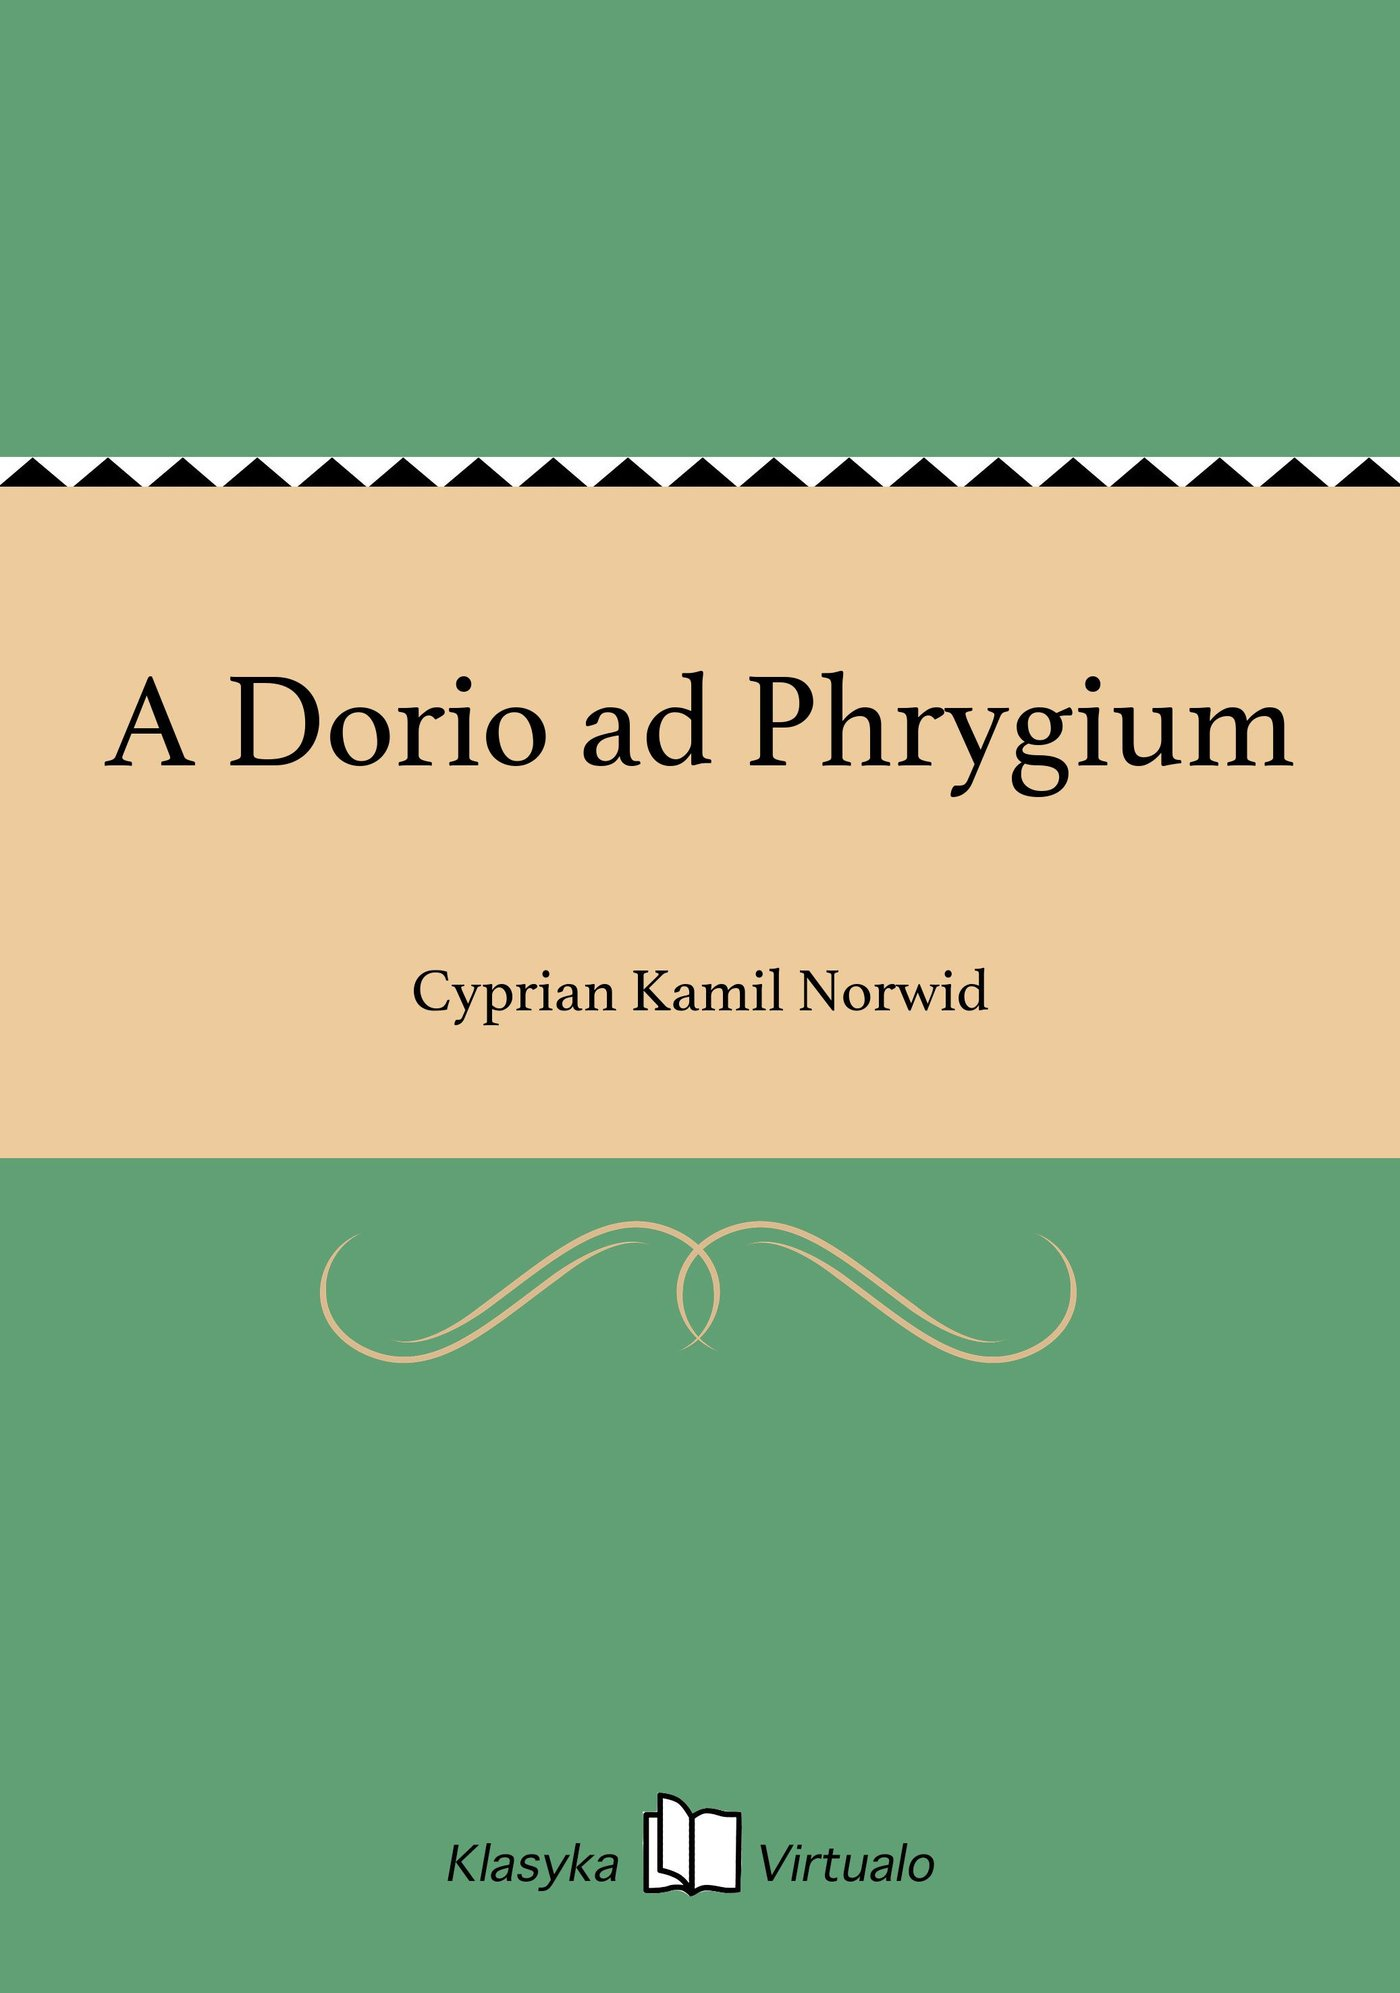 A Dorio ad Phrygium - Ebook (Książka EPUB) do pobrania w formacie EPUB